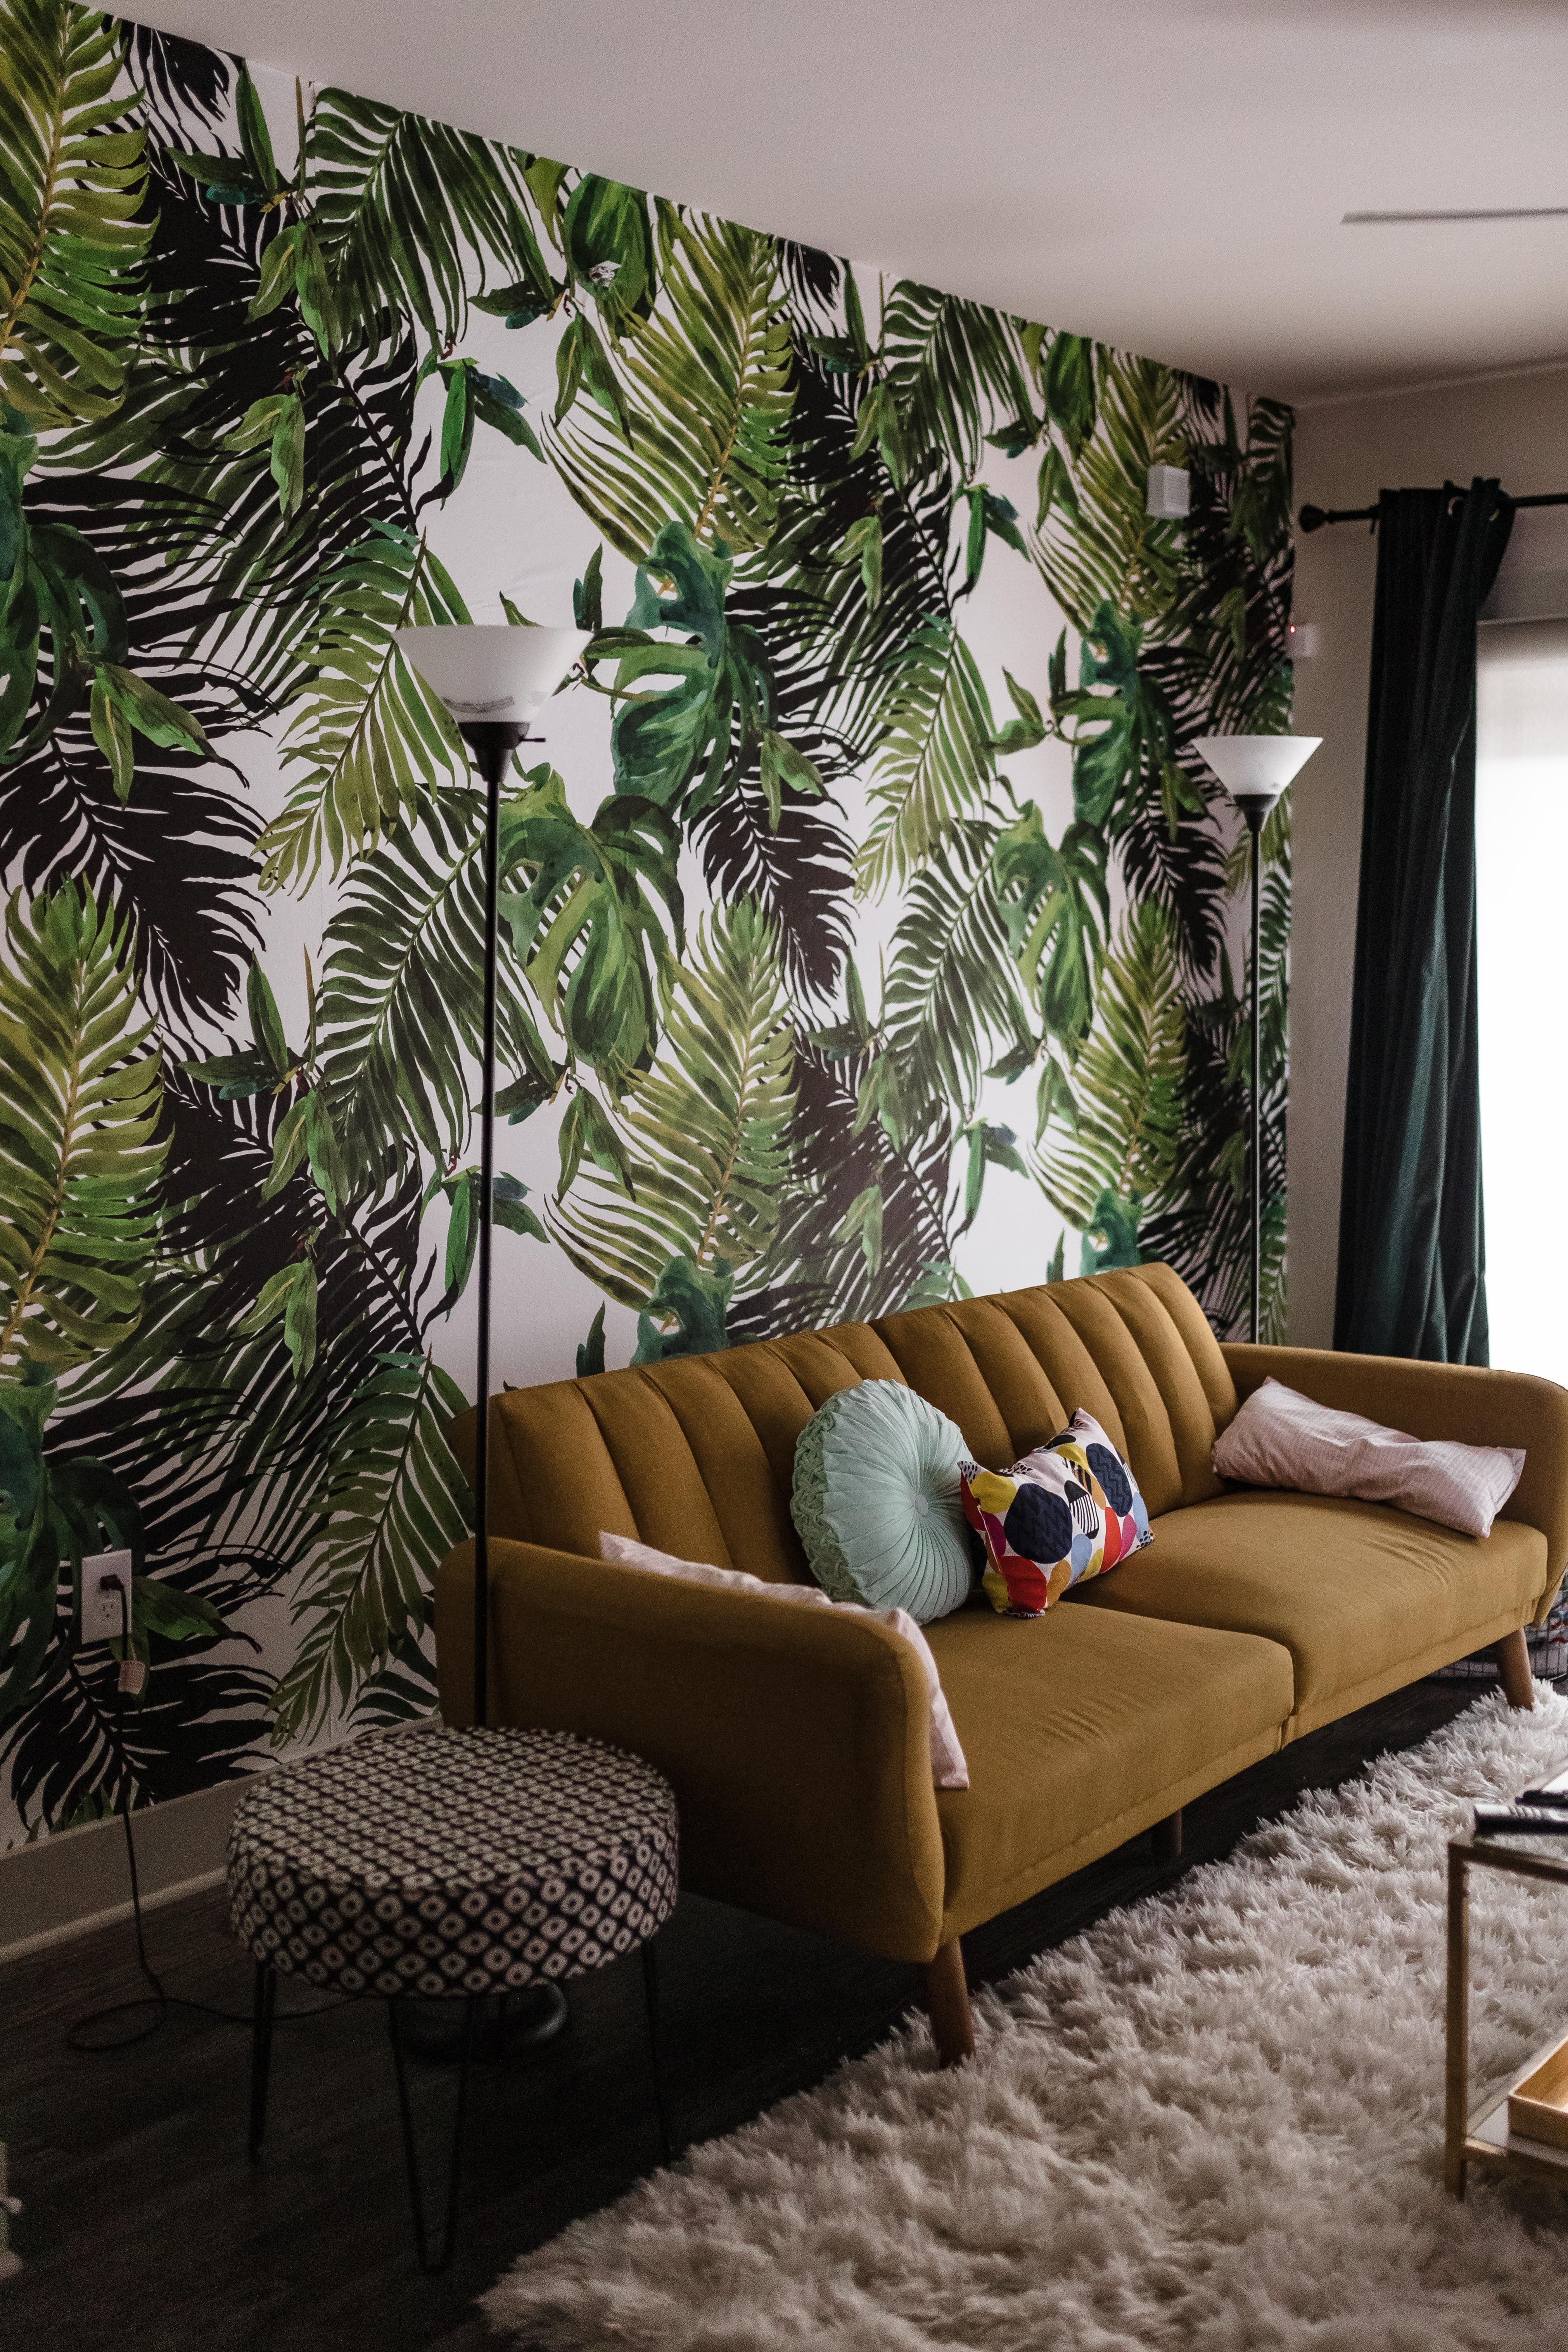 Fresh Tropical Wallpaper Wall Mural Tropical Home Decor Wallpaper Living Room Tropical Wallpaper #wallpaper #on #living #room #walls